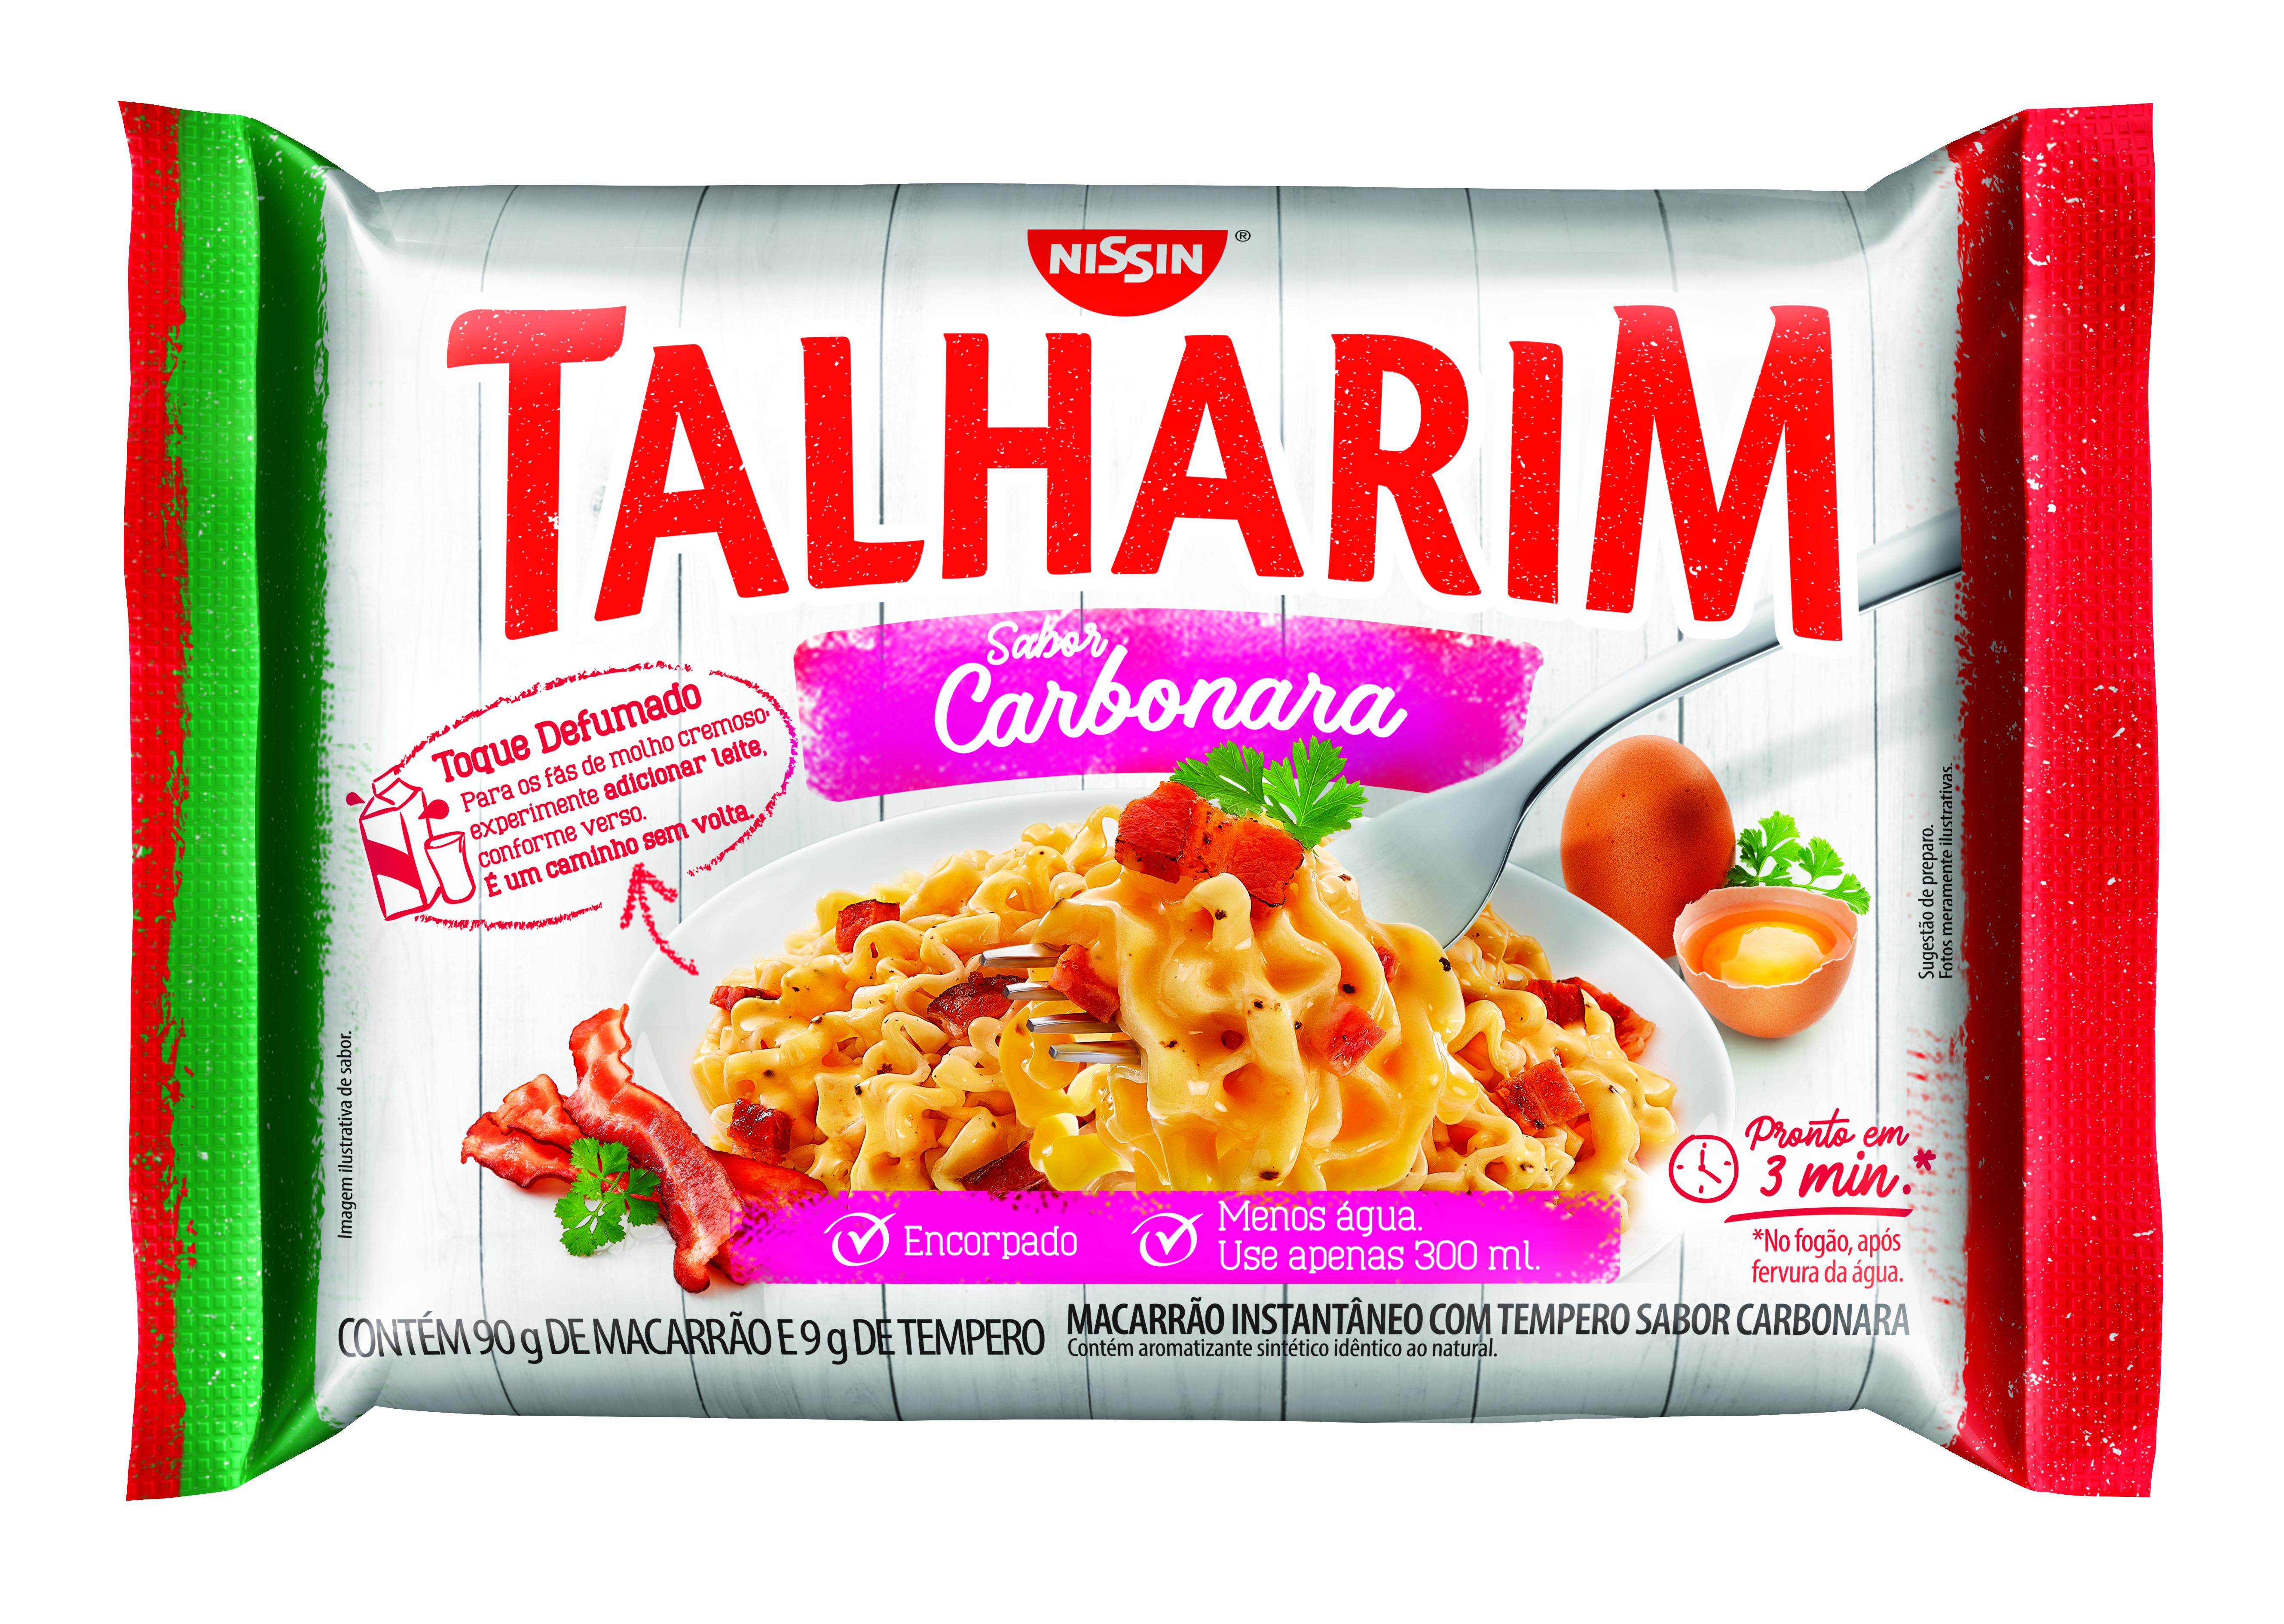 NISSIN TALHARIM SABOR CARBONARA 99GR(50)